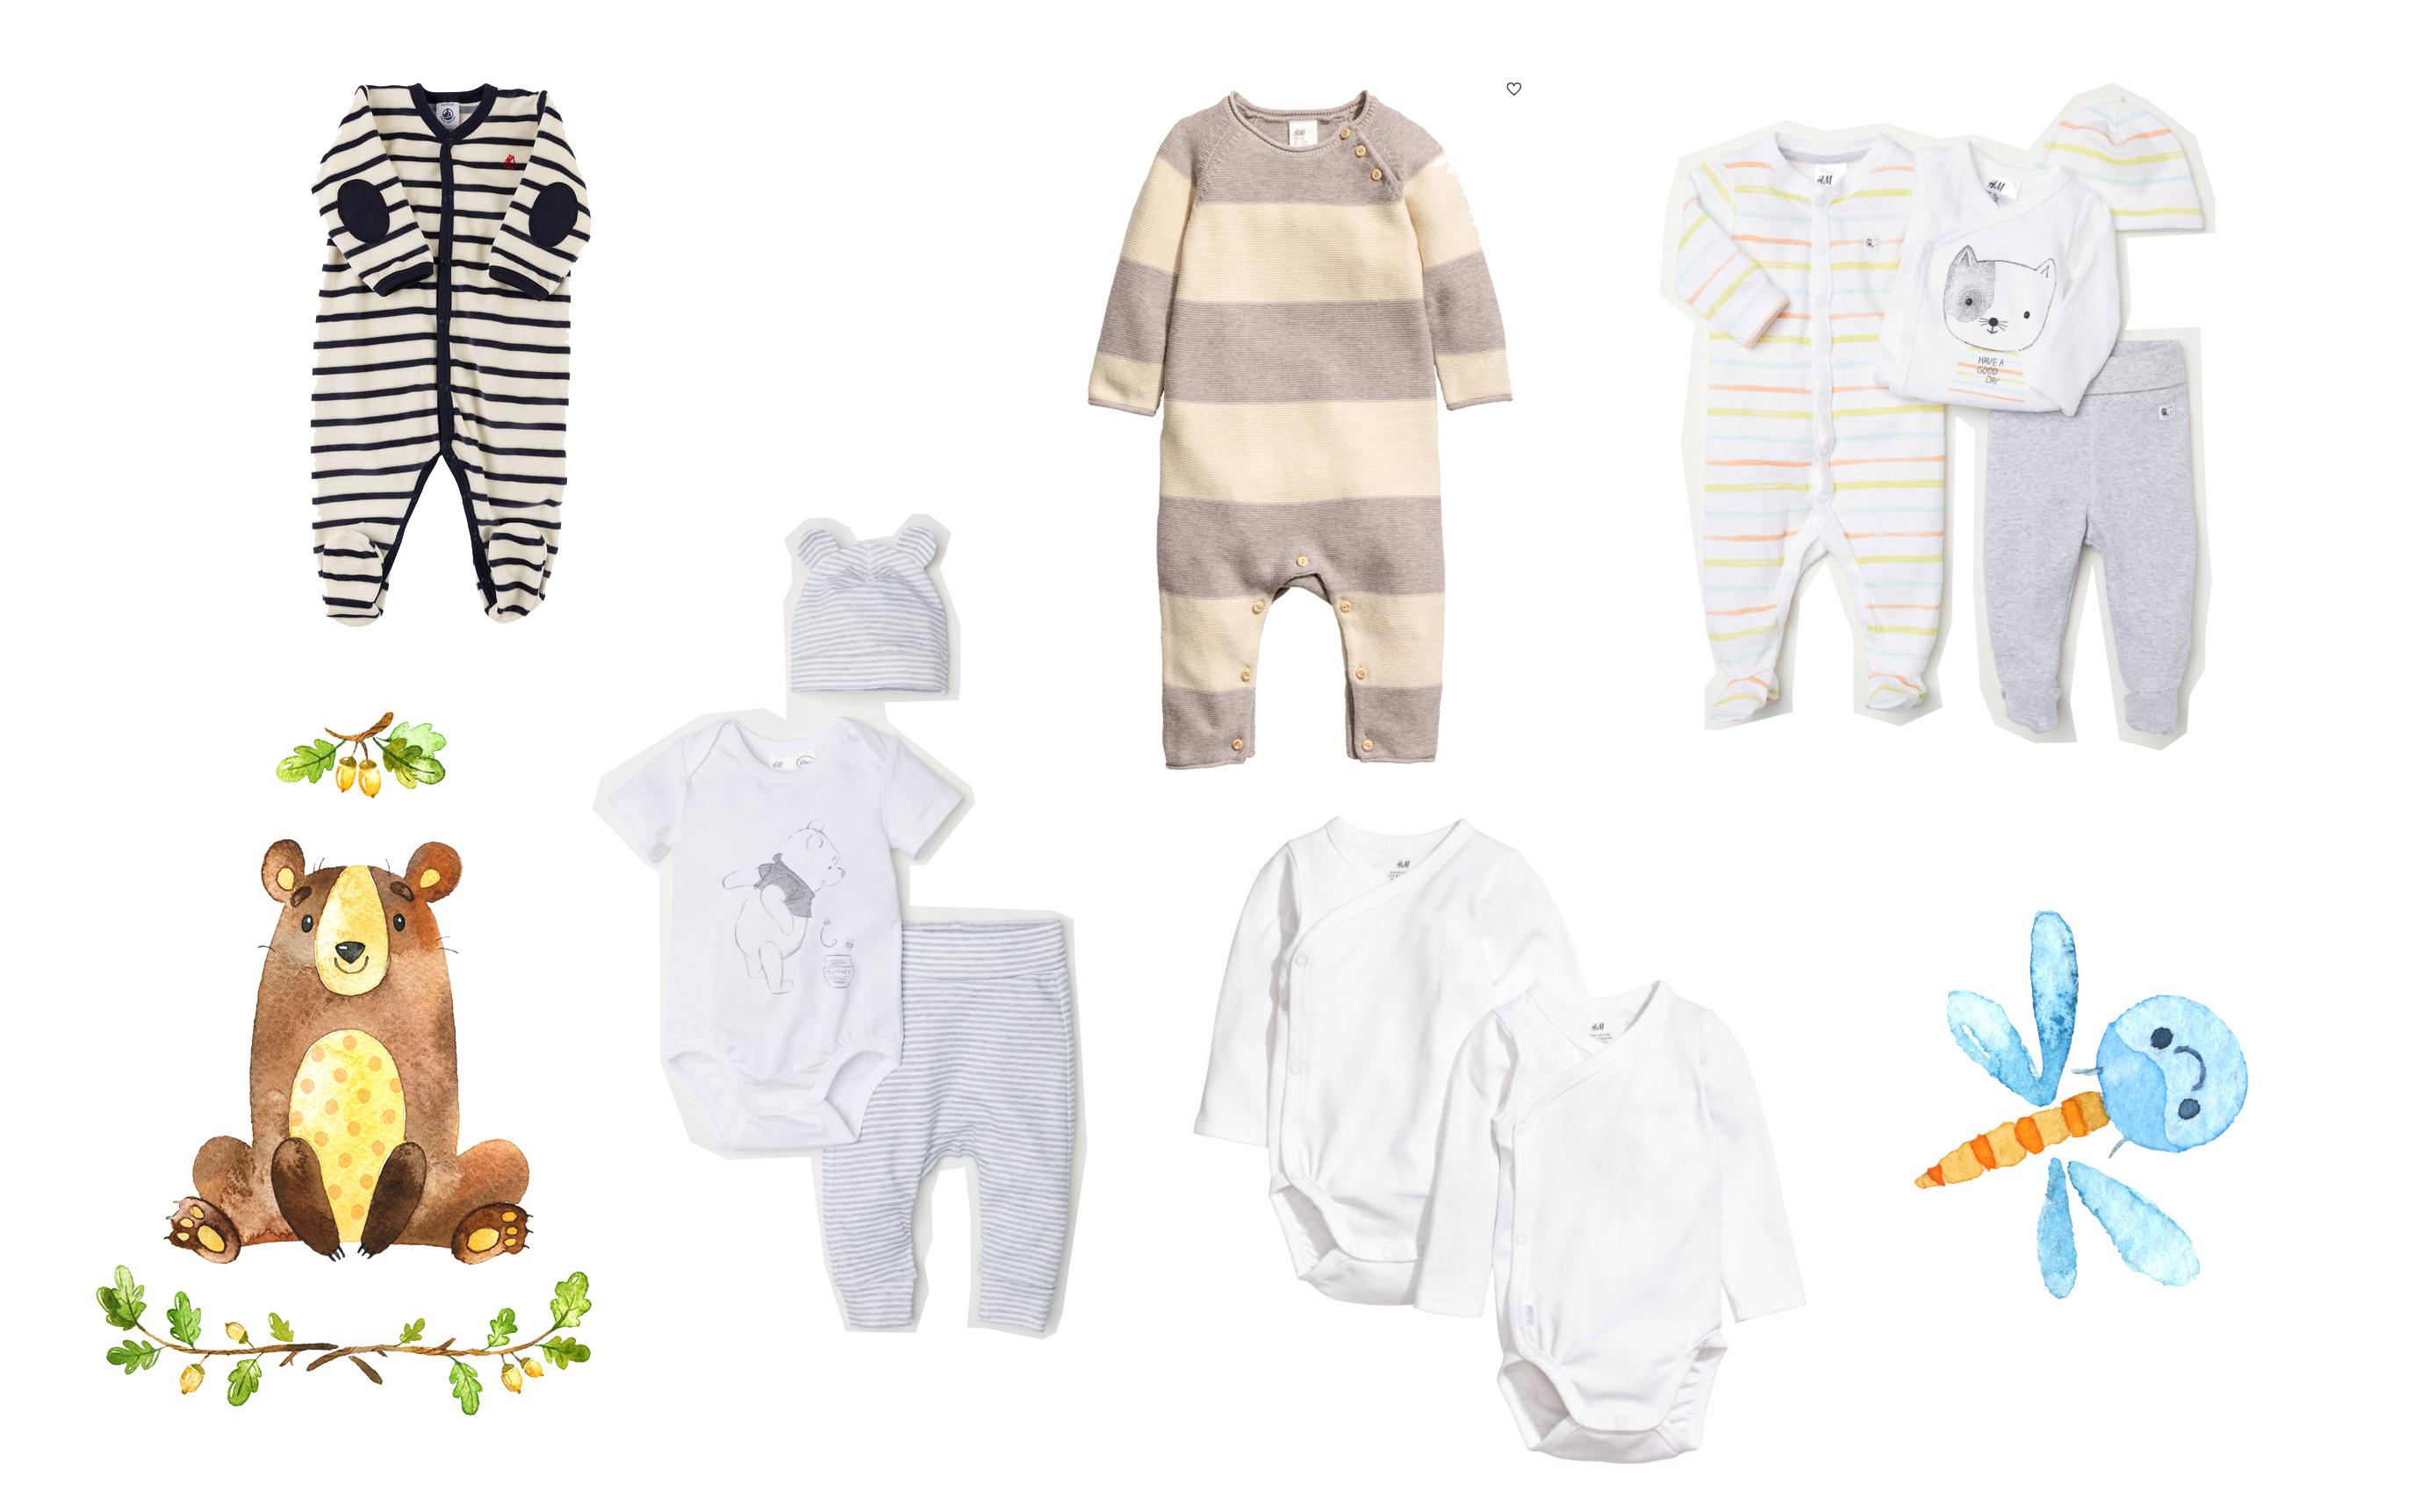 baby erstausstattung going home outfit kliniktasche